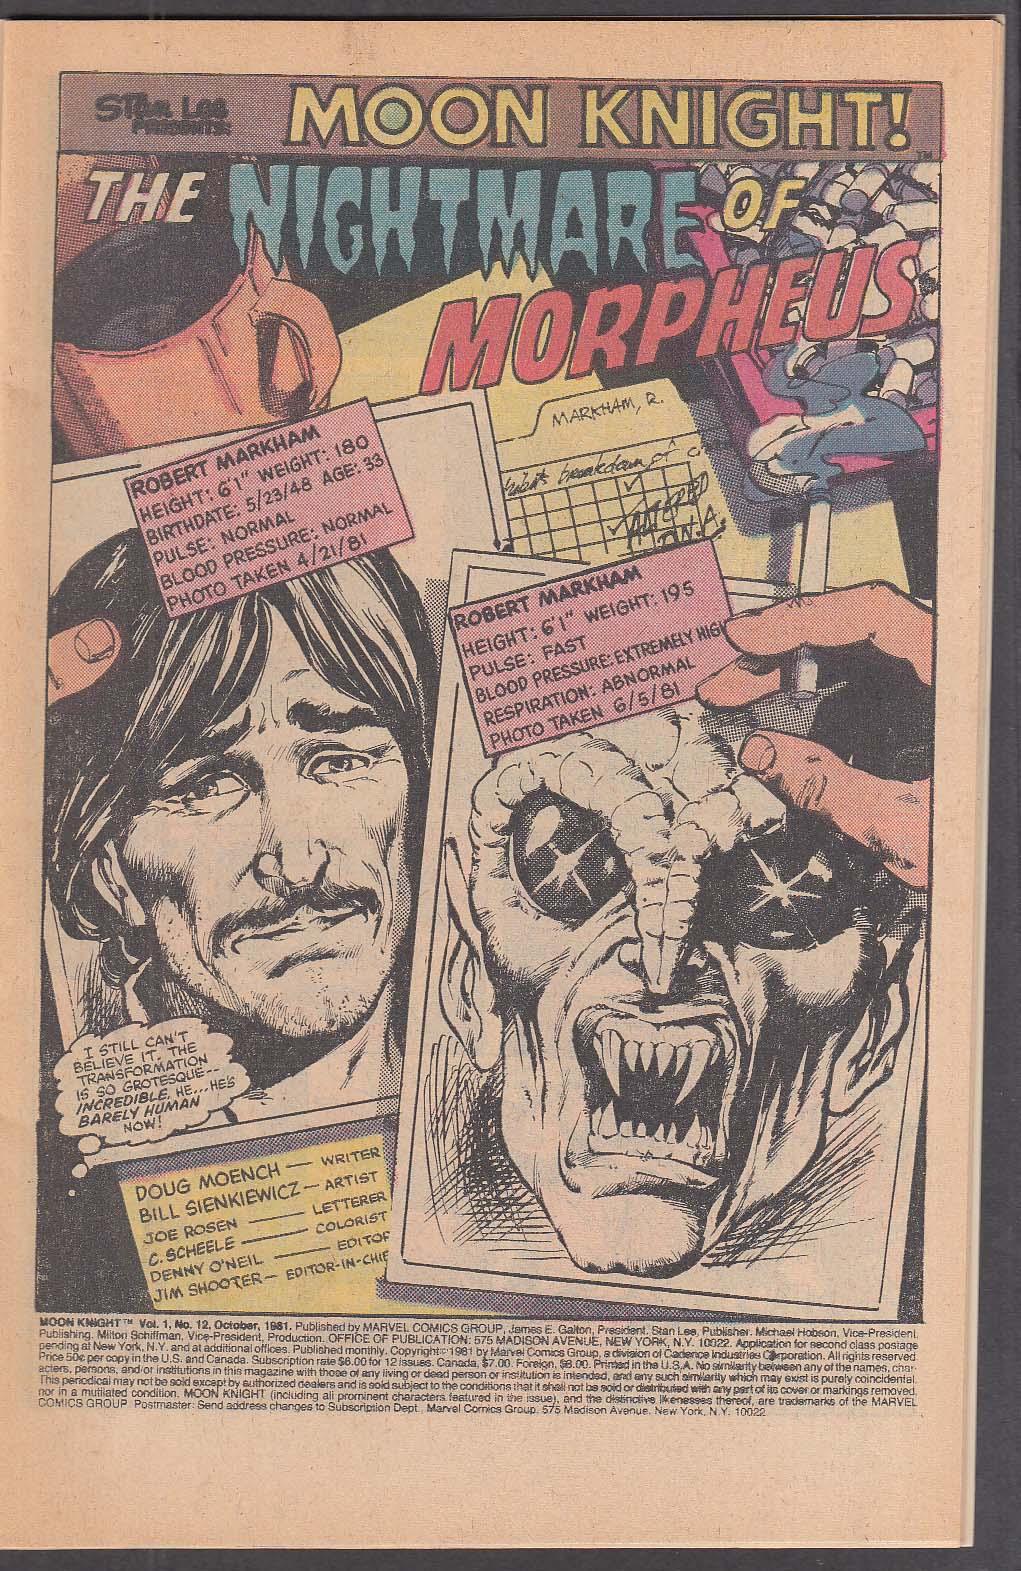 MOON KNIGHT #12 Marvel comic book 10 1981